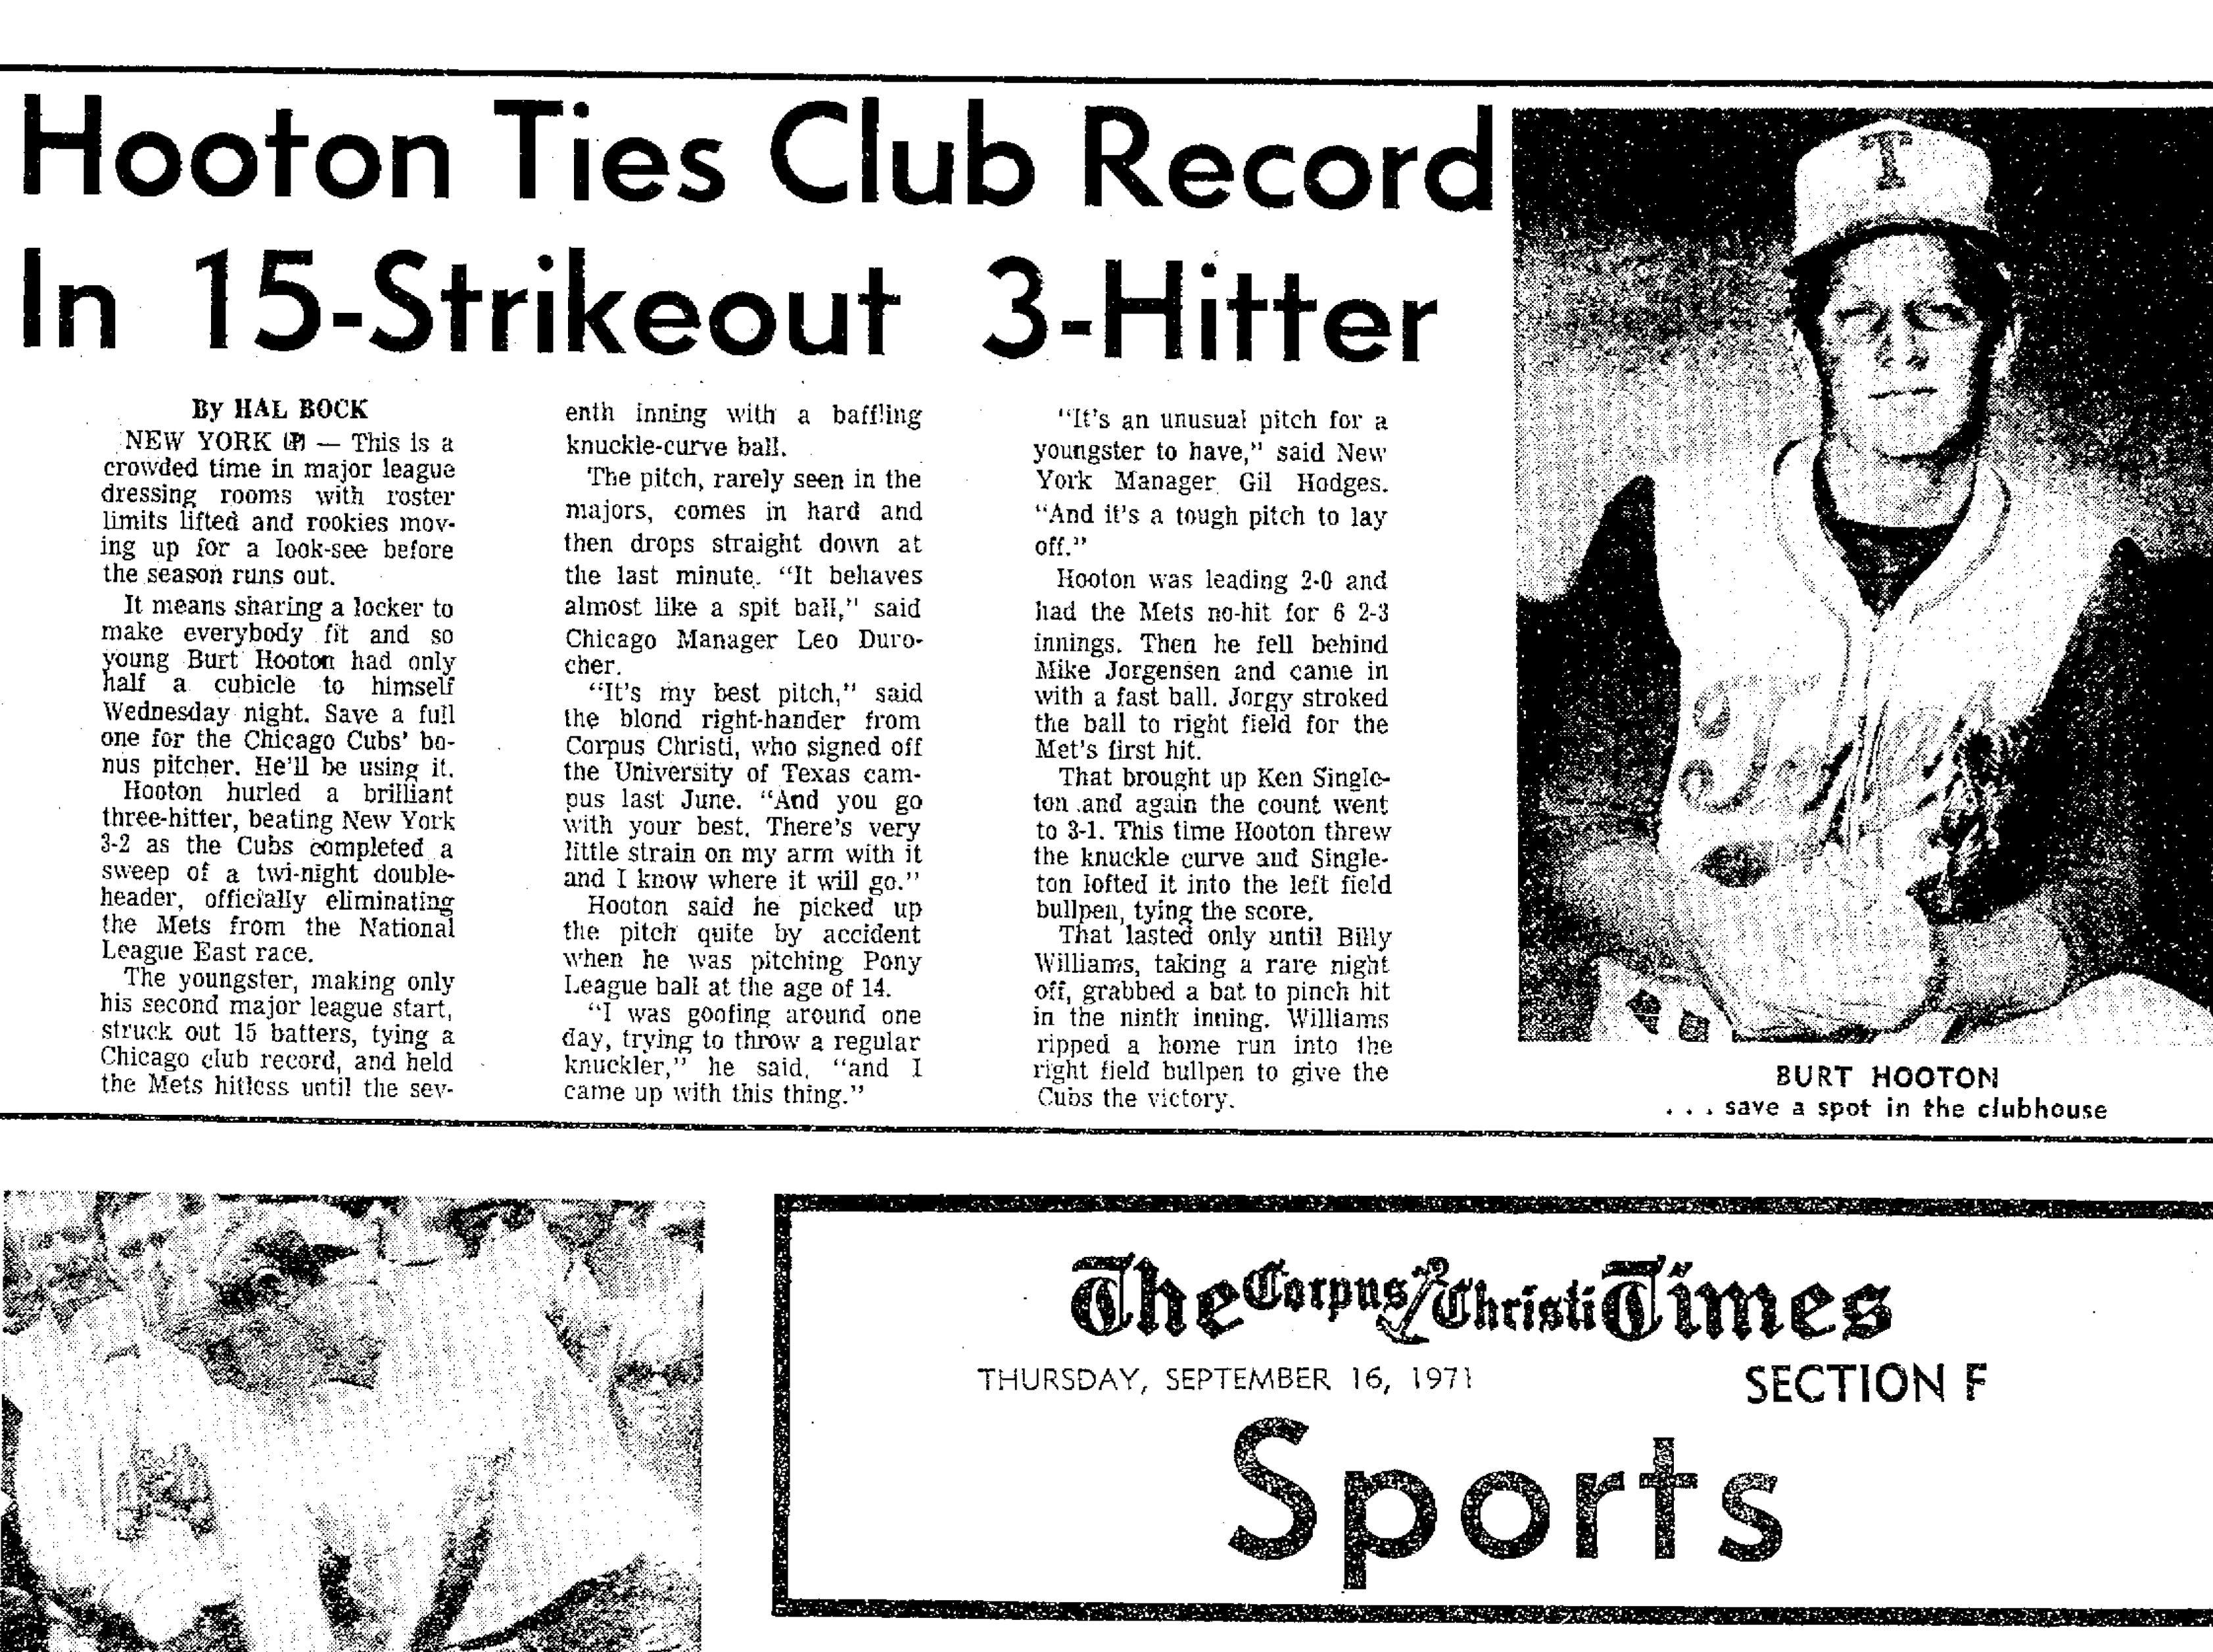 Article on Burt Hooton from the Sept. 16, 1971 Corpus Christi Times.